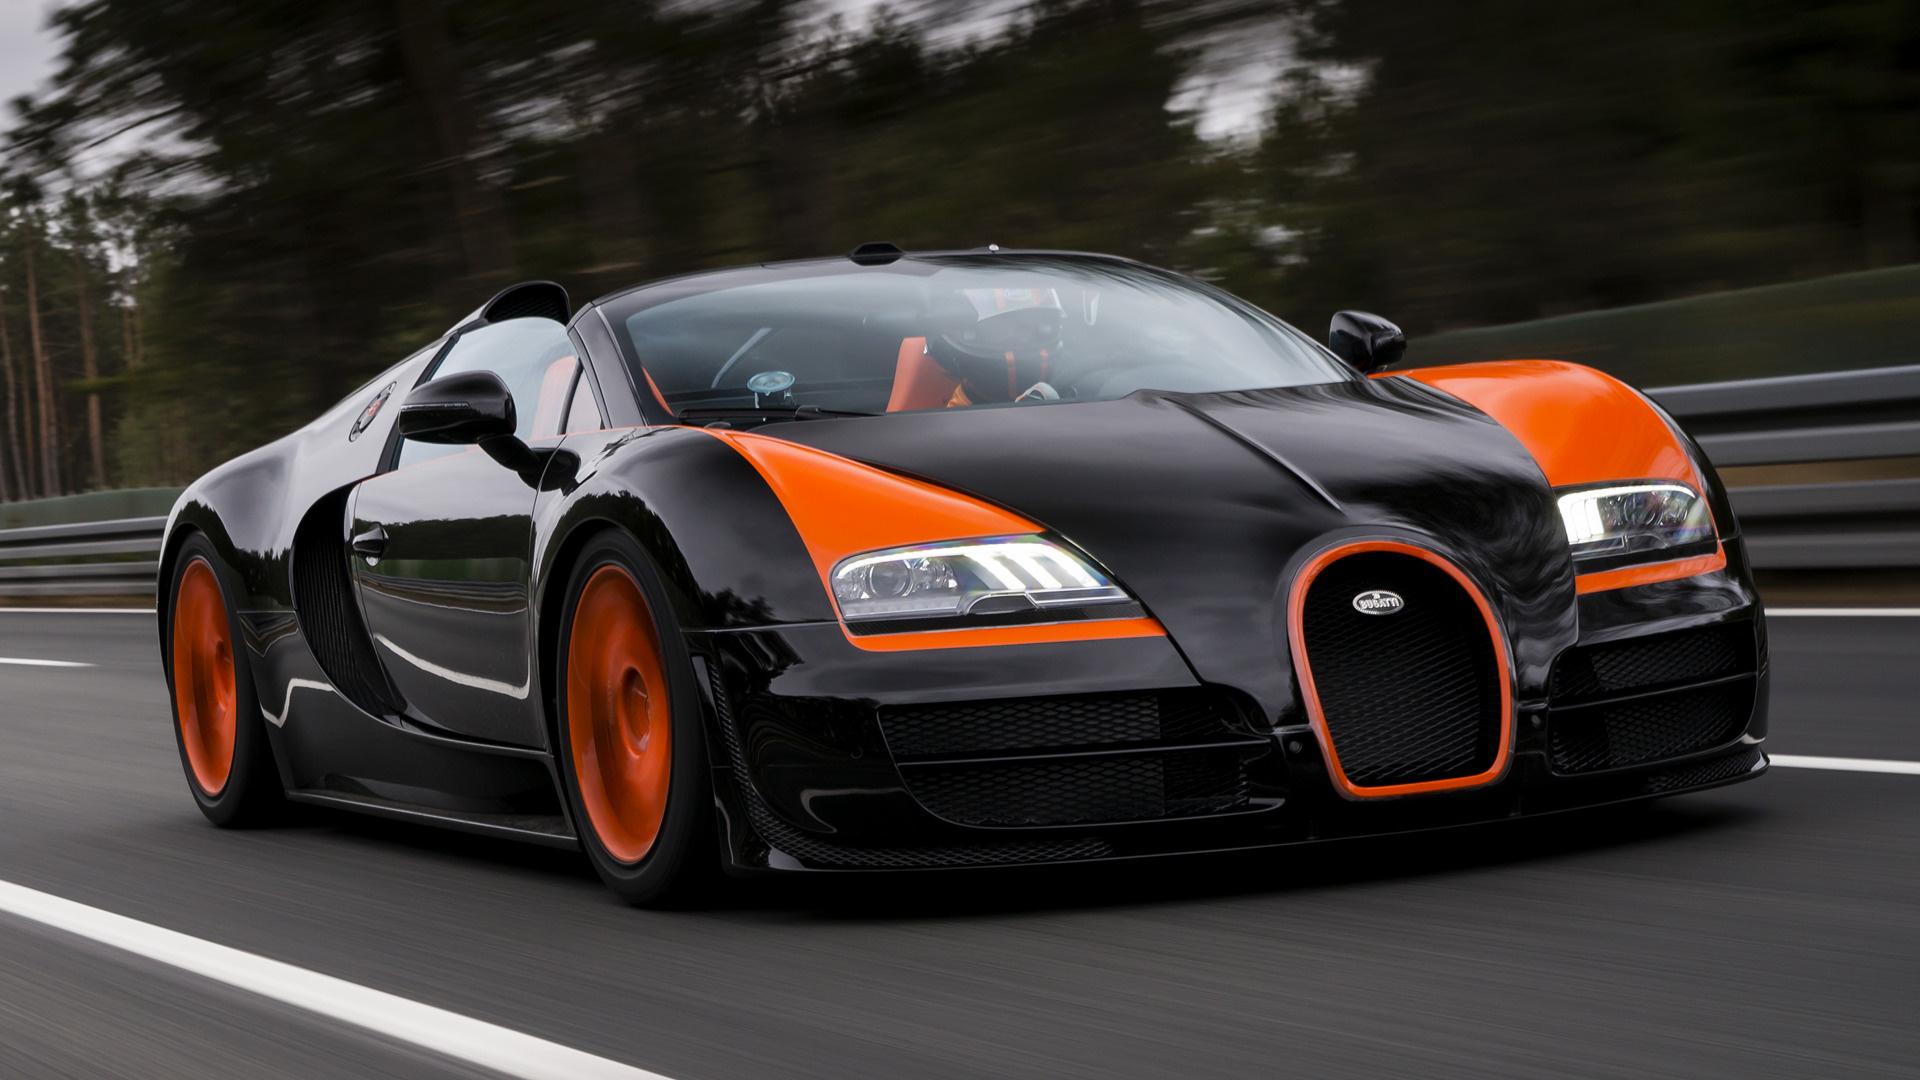 2013 Bugatti Veyron Grand Sport Vitesse WRC Edition